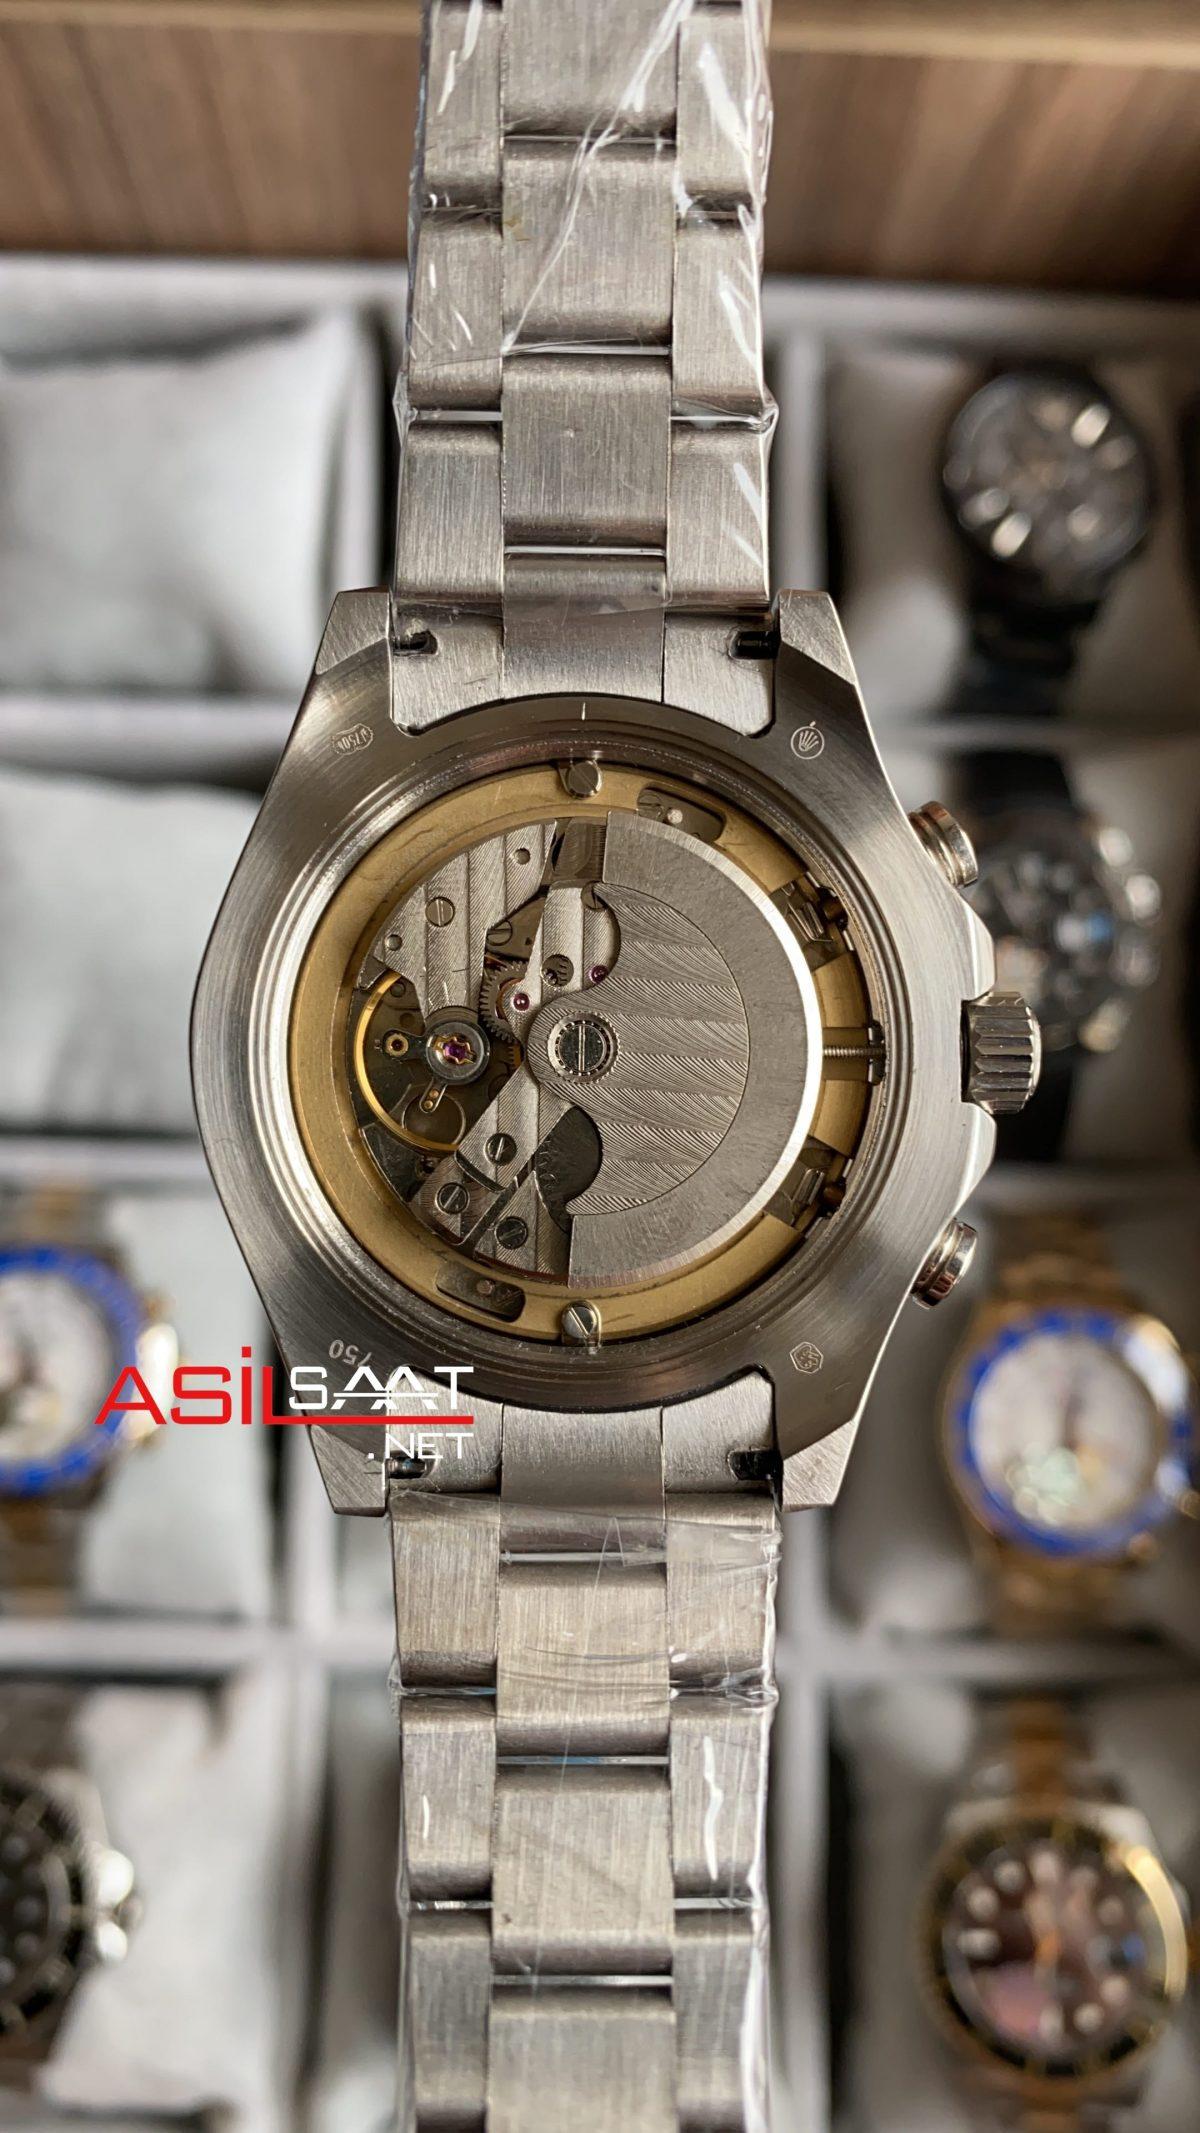 Rolex Yacht Master 2 Mercedes Hands 116680 44 mm ROLYM001